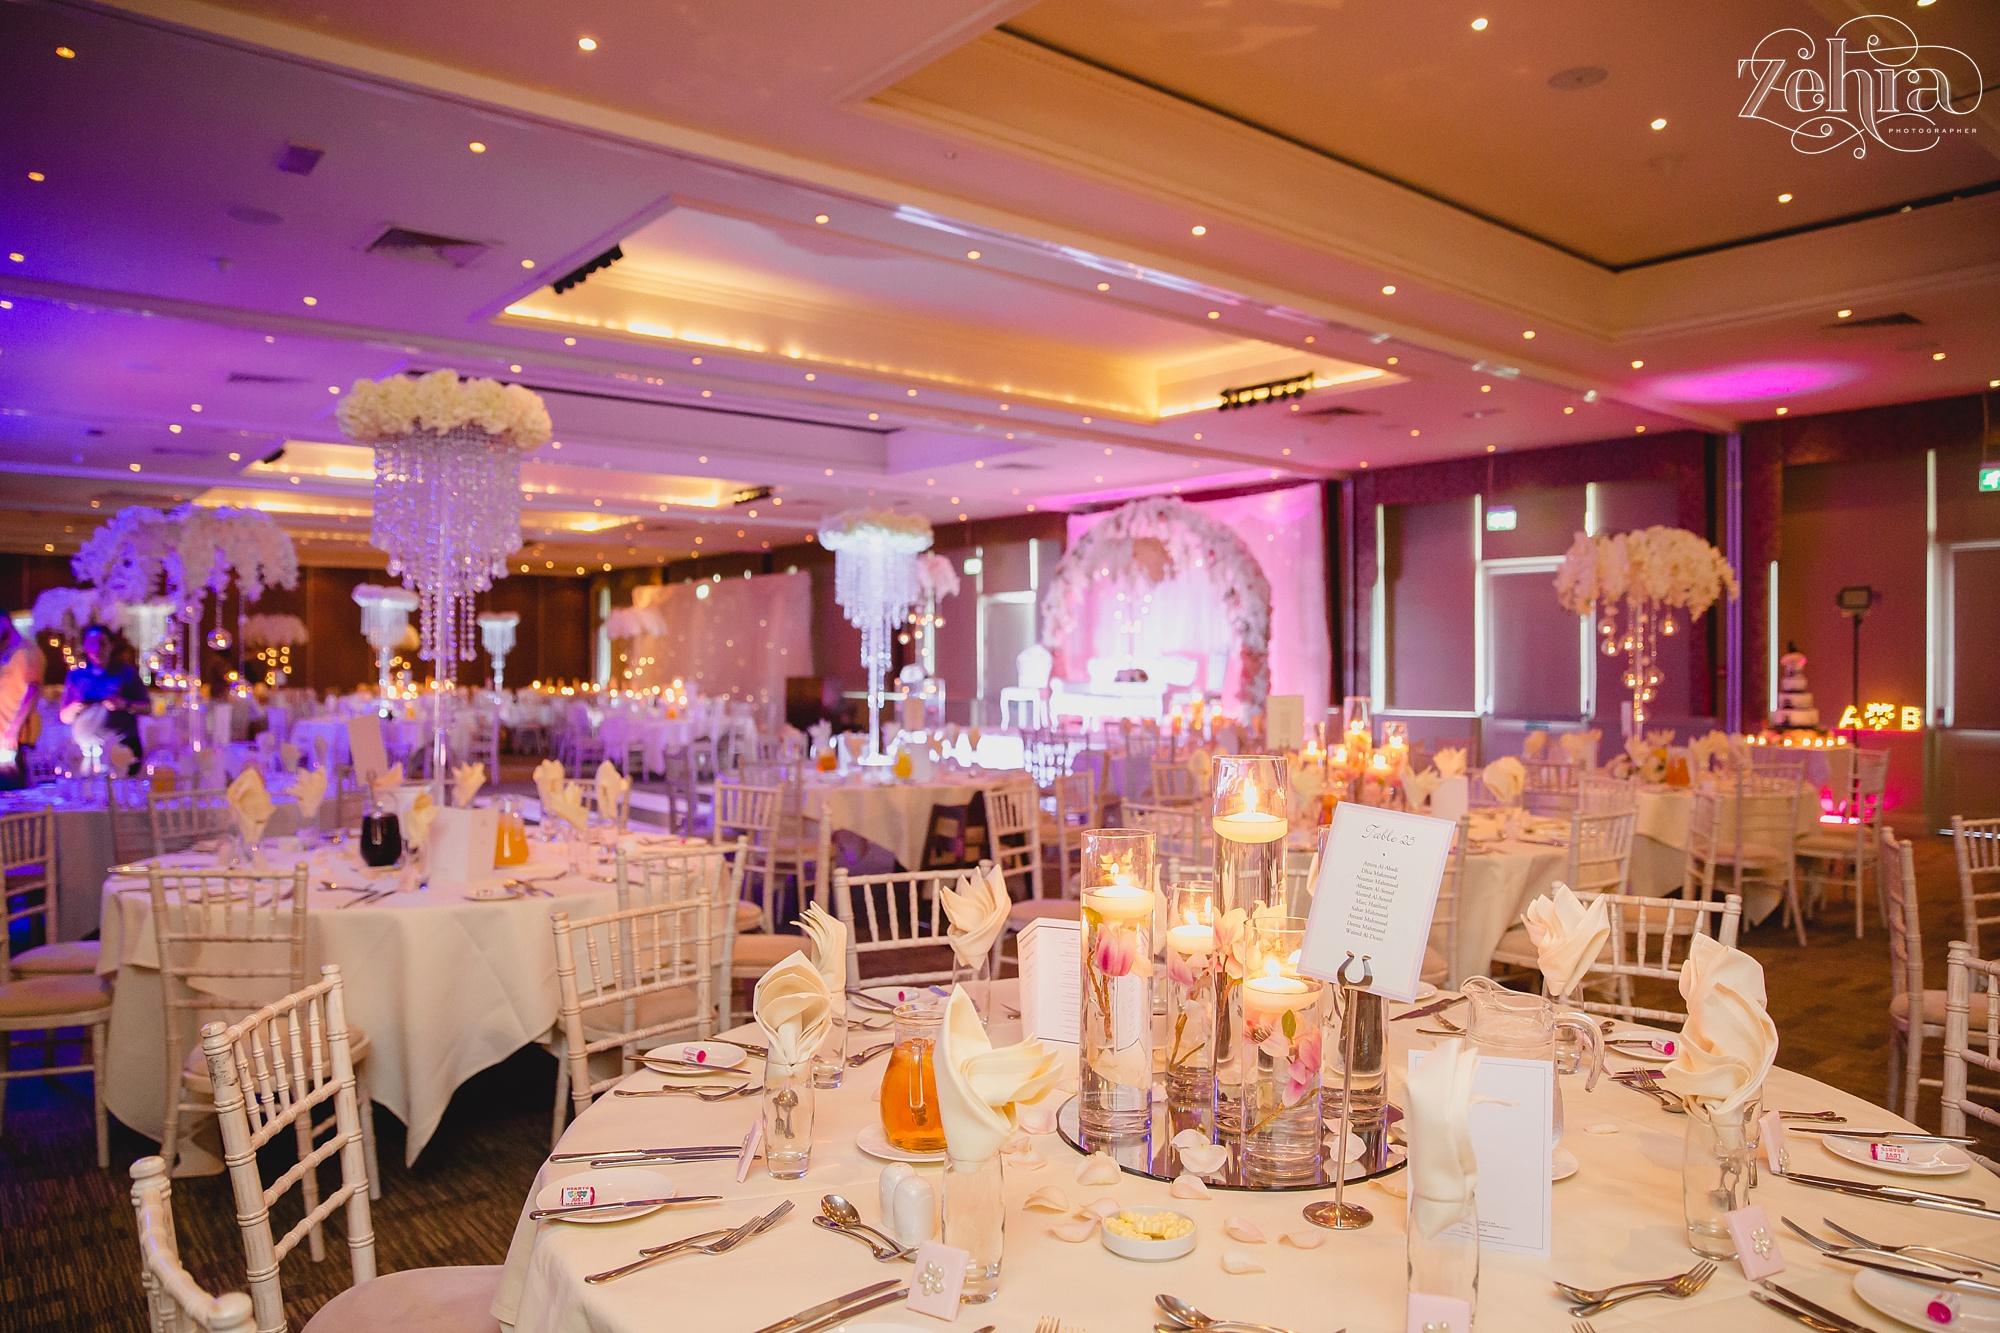 zehra photographer mere cheshire wedding_0026.jpg